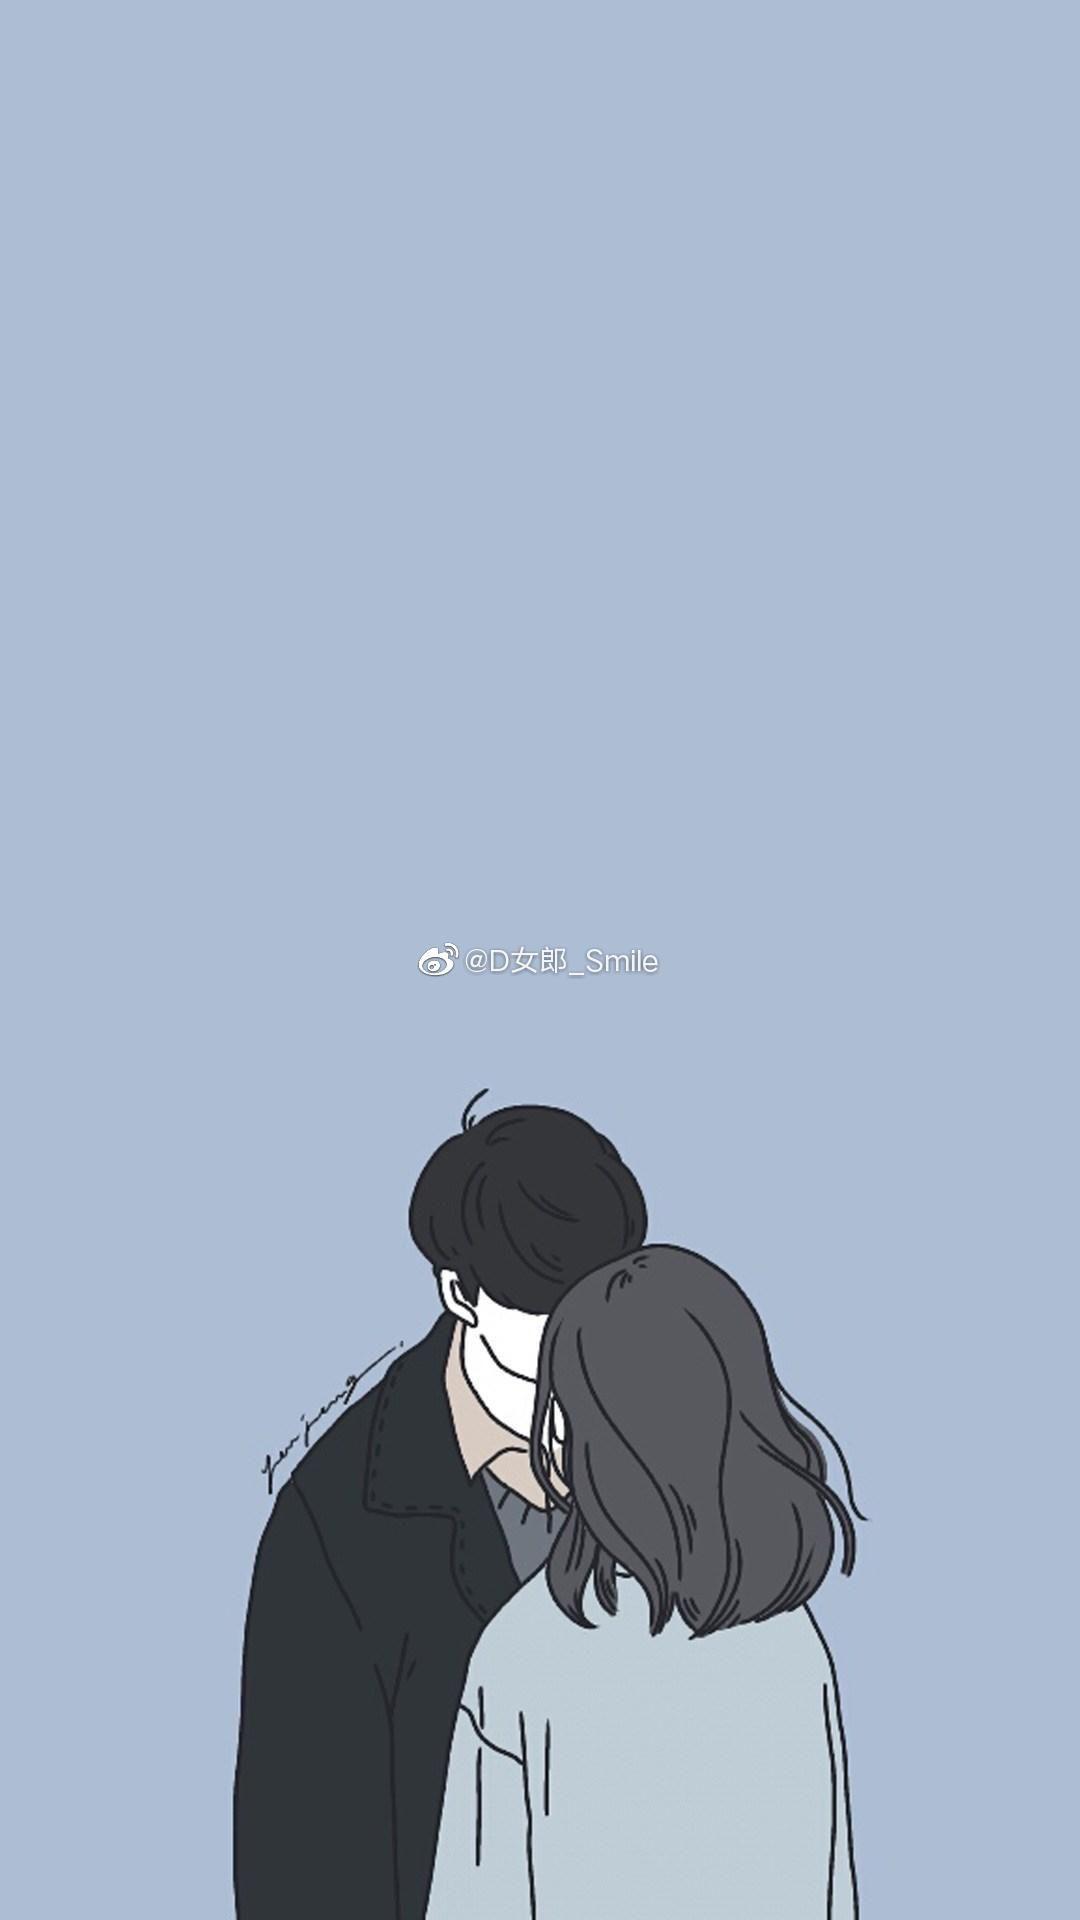 Pin Oleh Min Mzln Di Anime Di 2020 Ilustrasi Karakter Ilustrasi Lukisan Seni